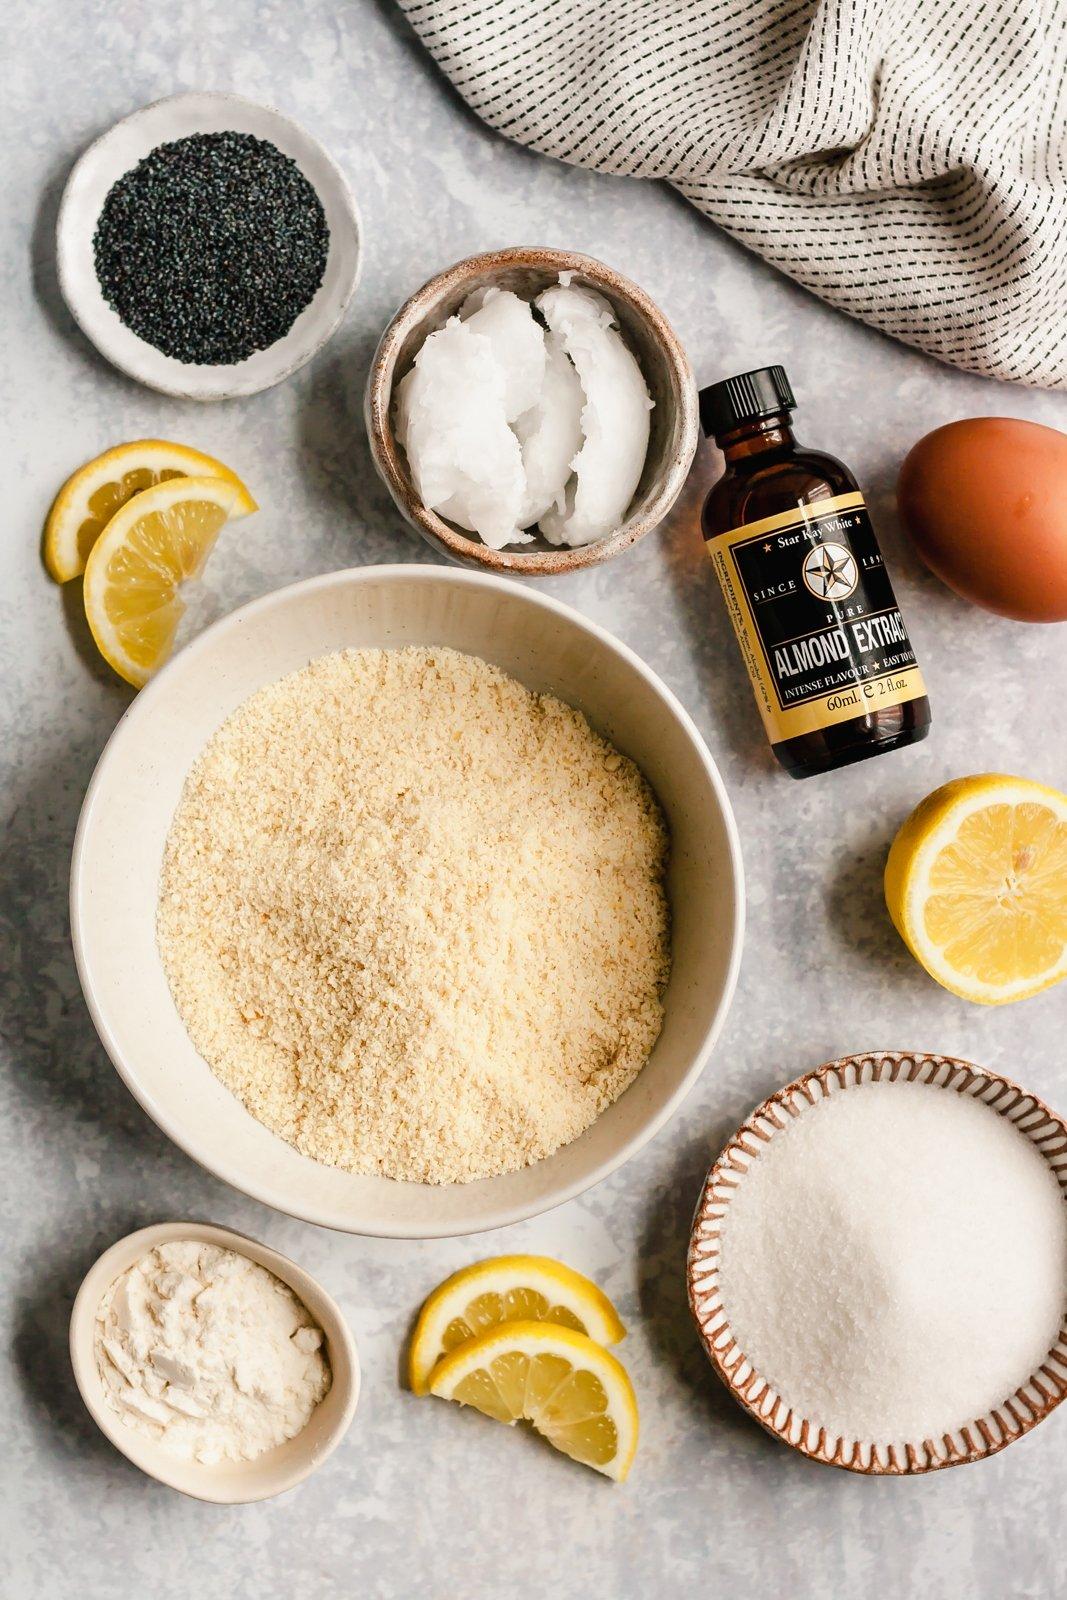 ingredients for paleo lemon poppyseed cookies on a grey board